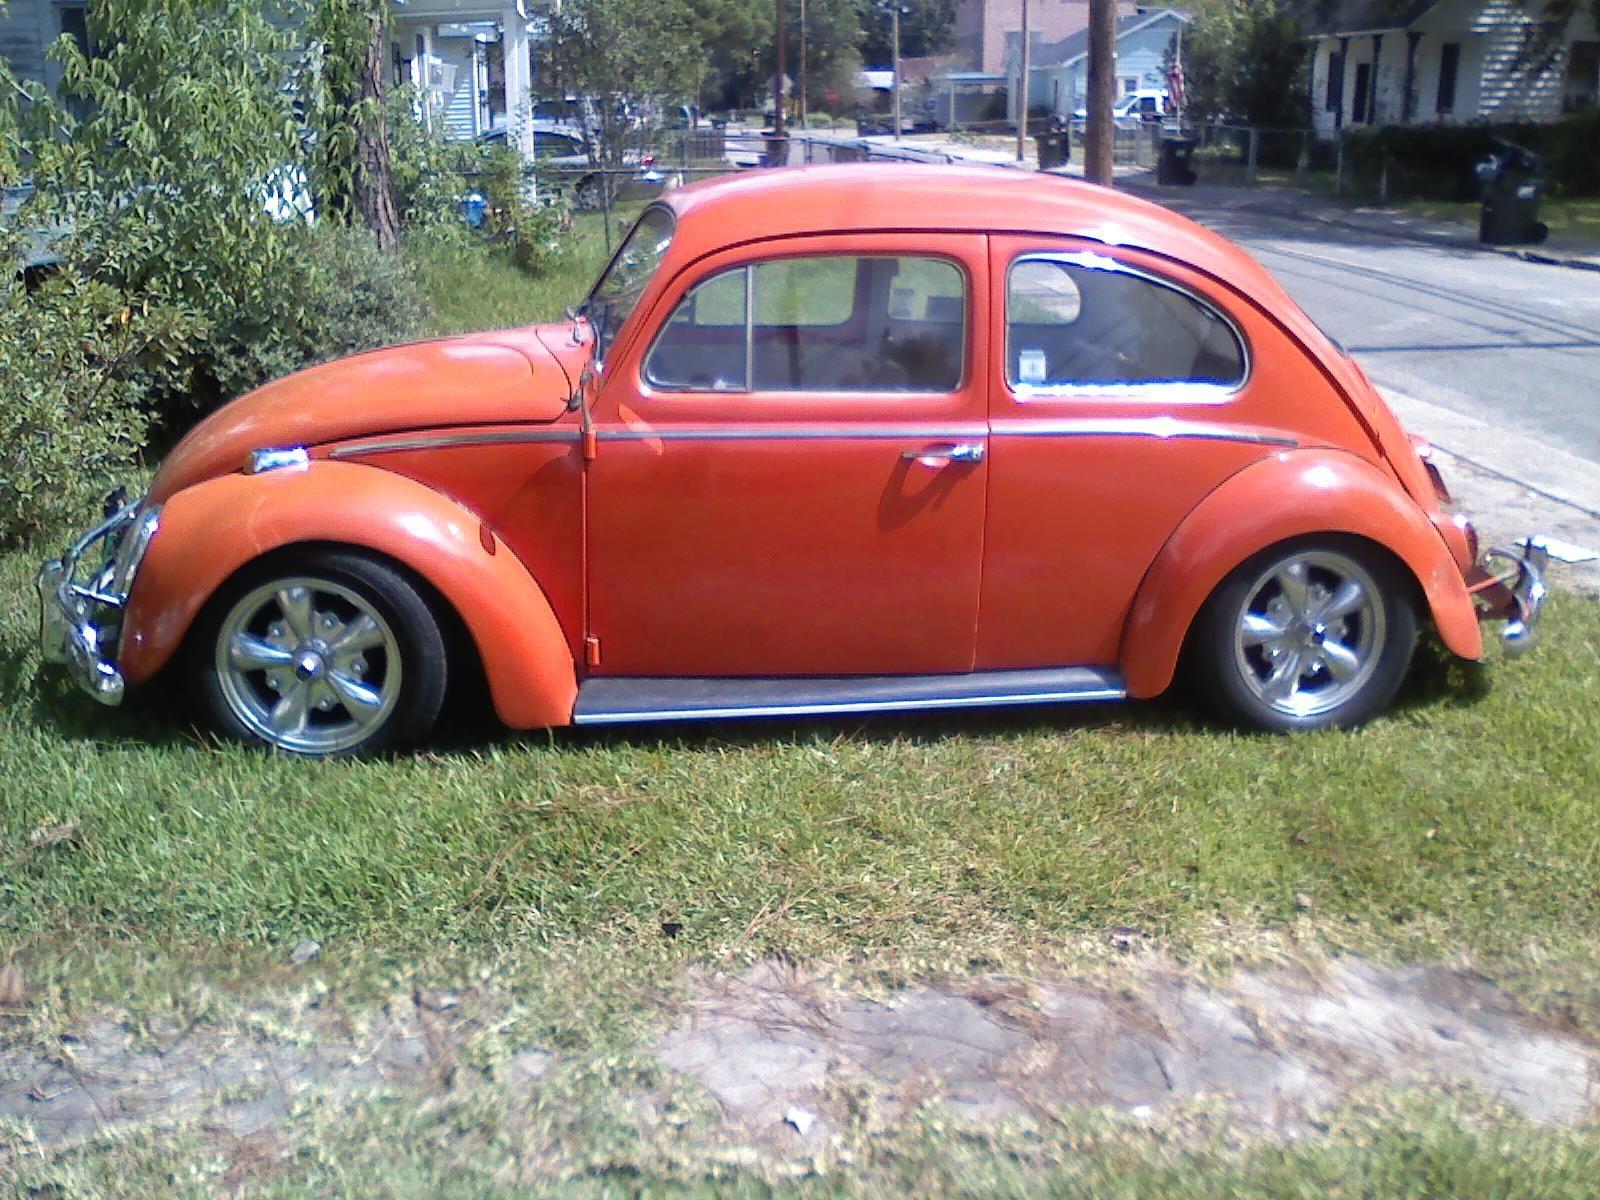 Convertible Vw Bug >> 69 vw beetle | VW Bugs | Pinterest